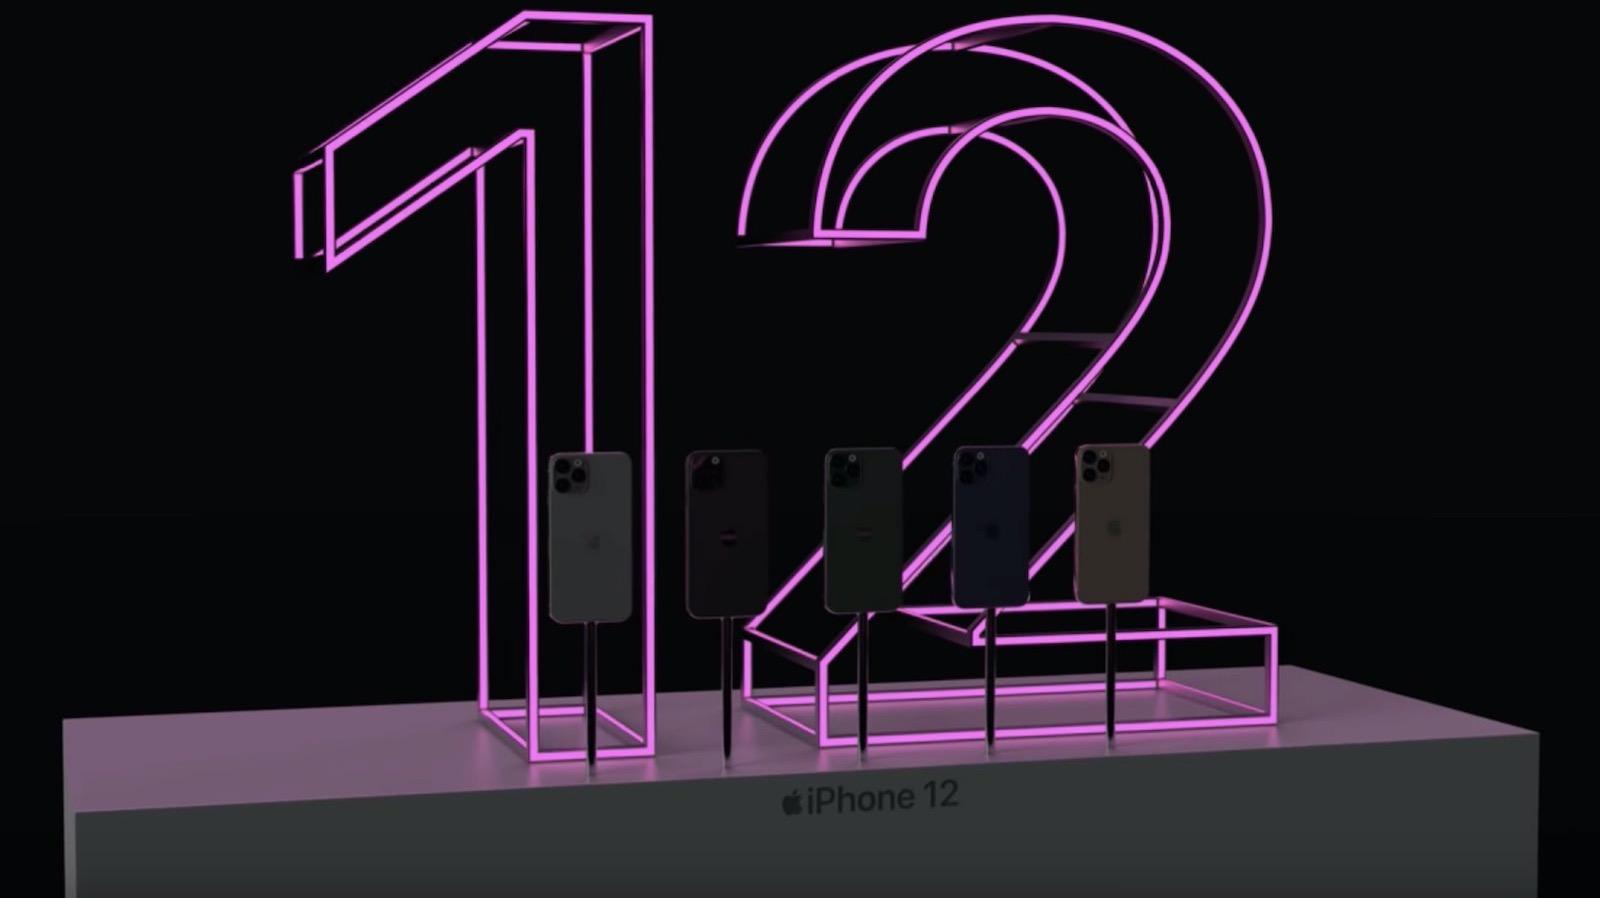 iphone-12-image-concept.jpg